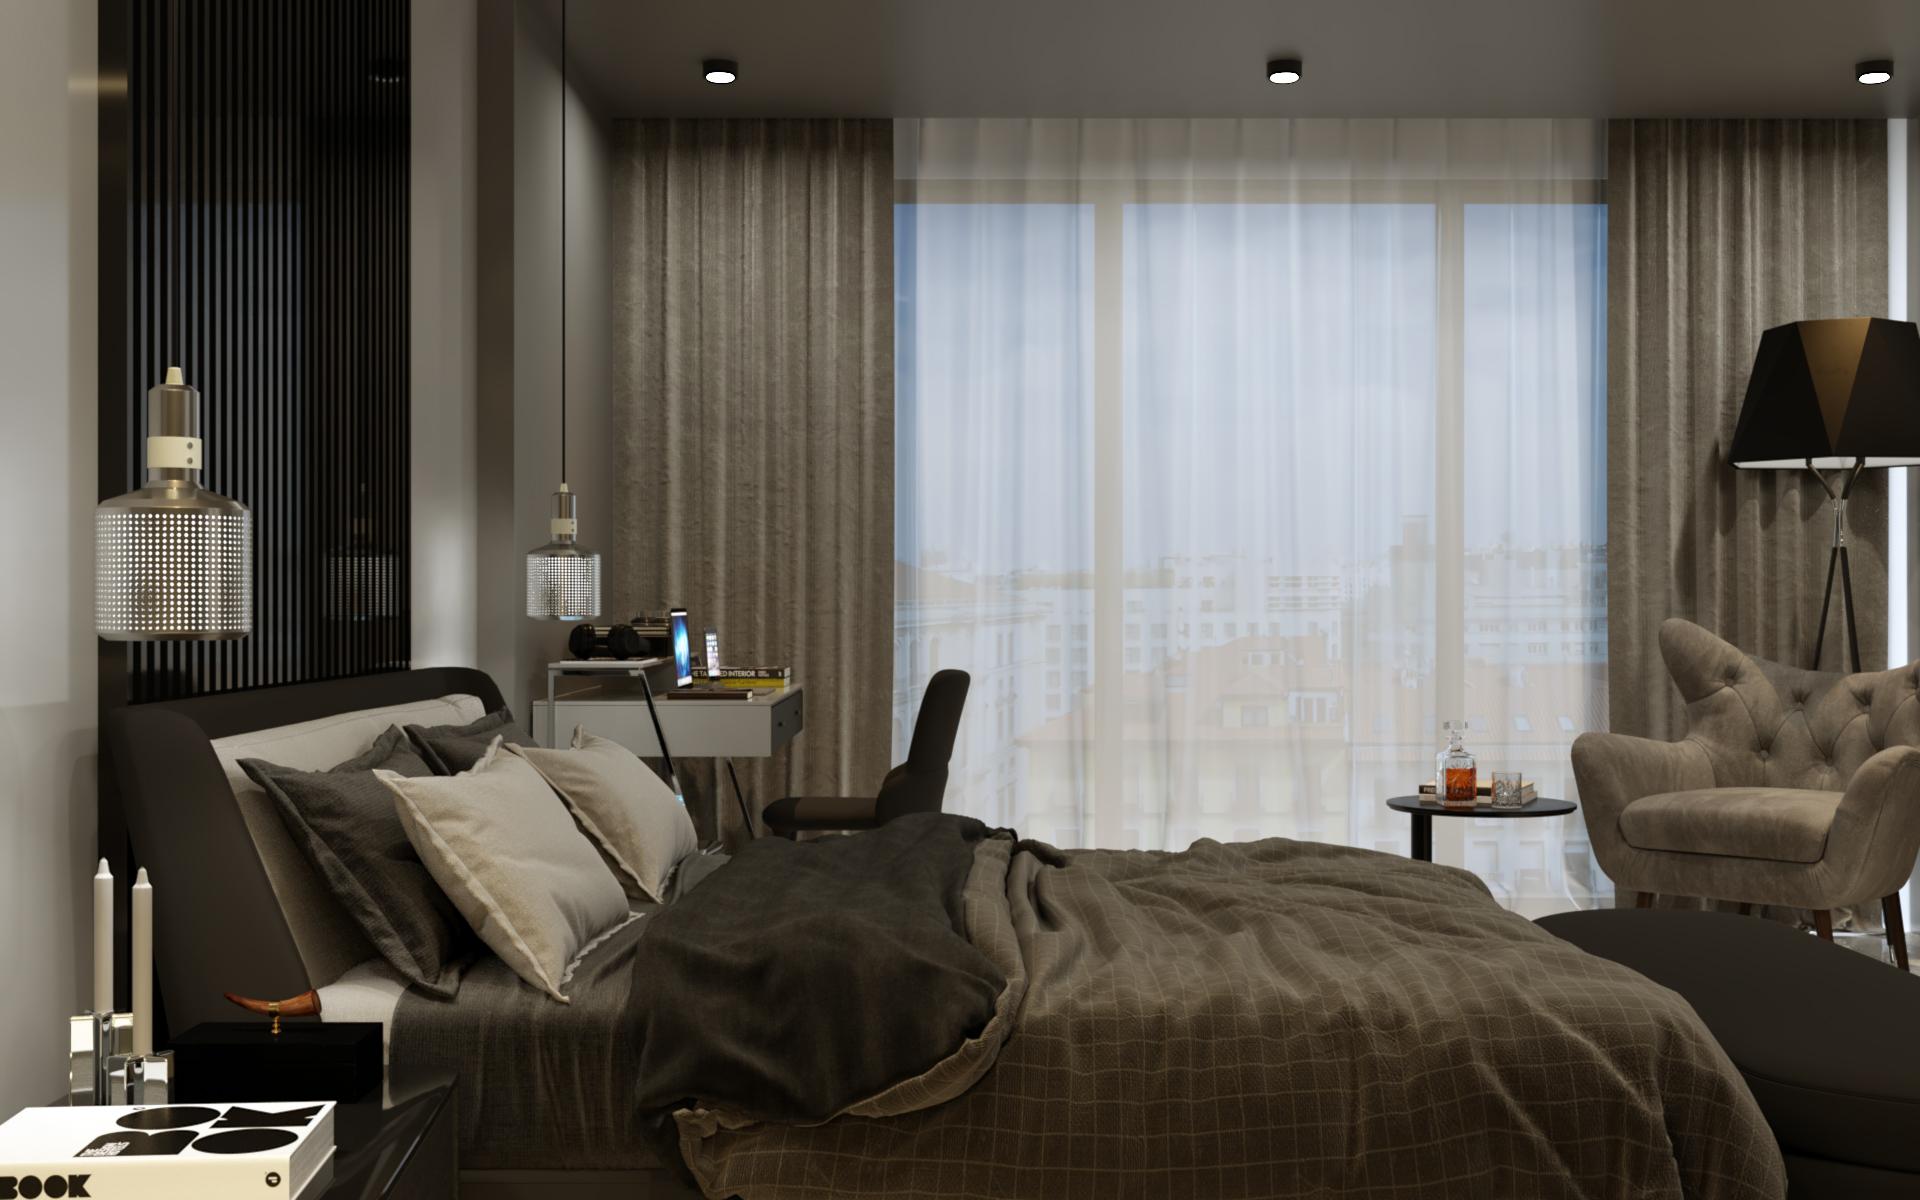 Dormitorio_Vivienda_Barcelona_004